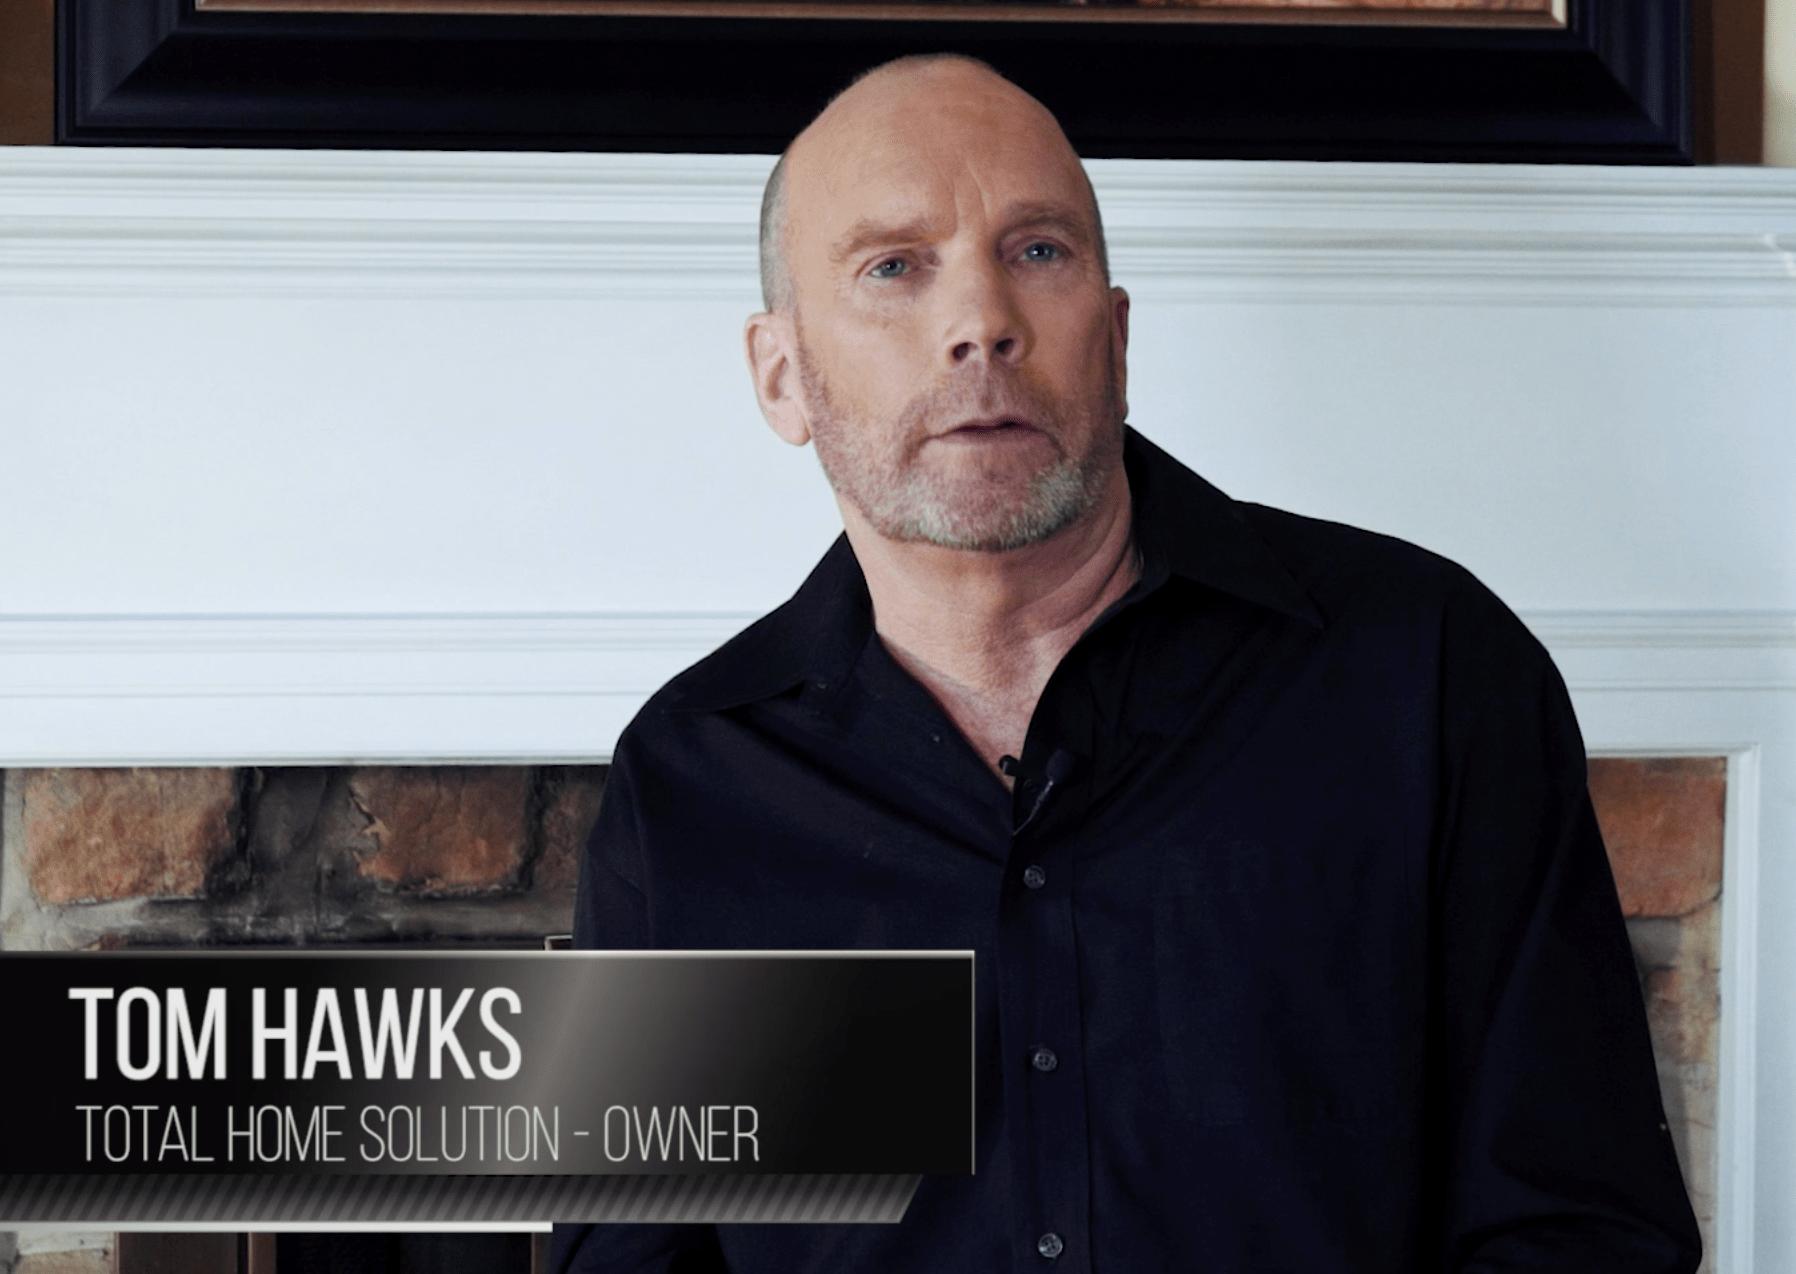 Tom Hawks - Total Home Solution